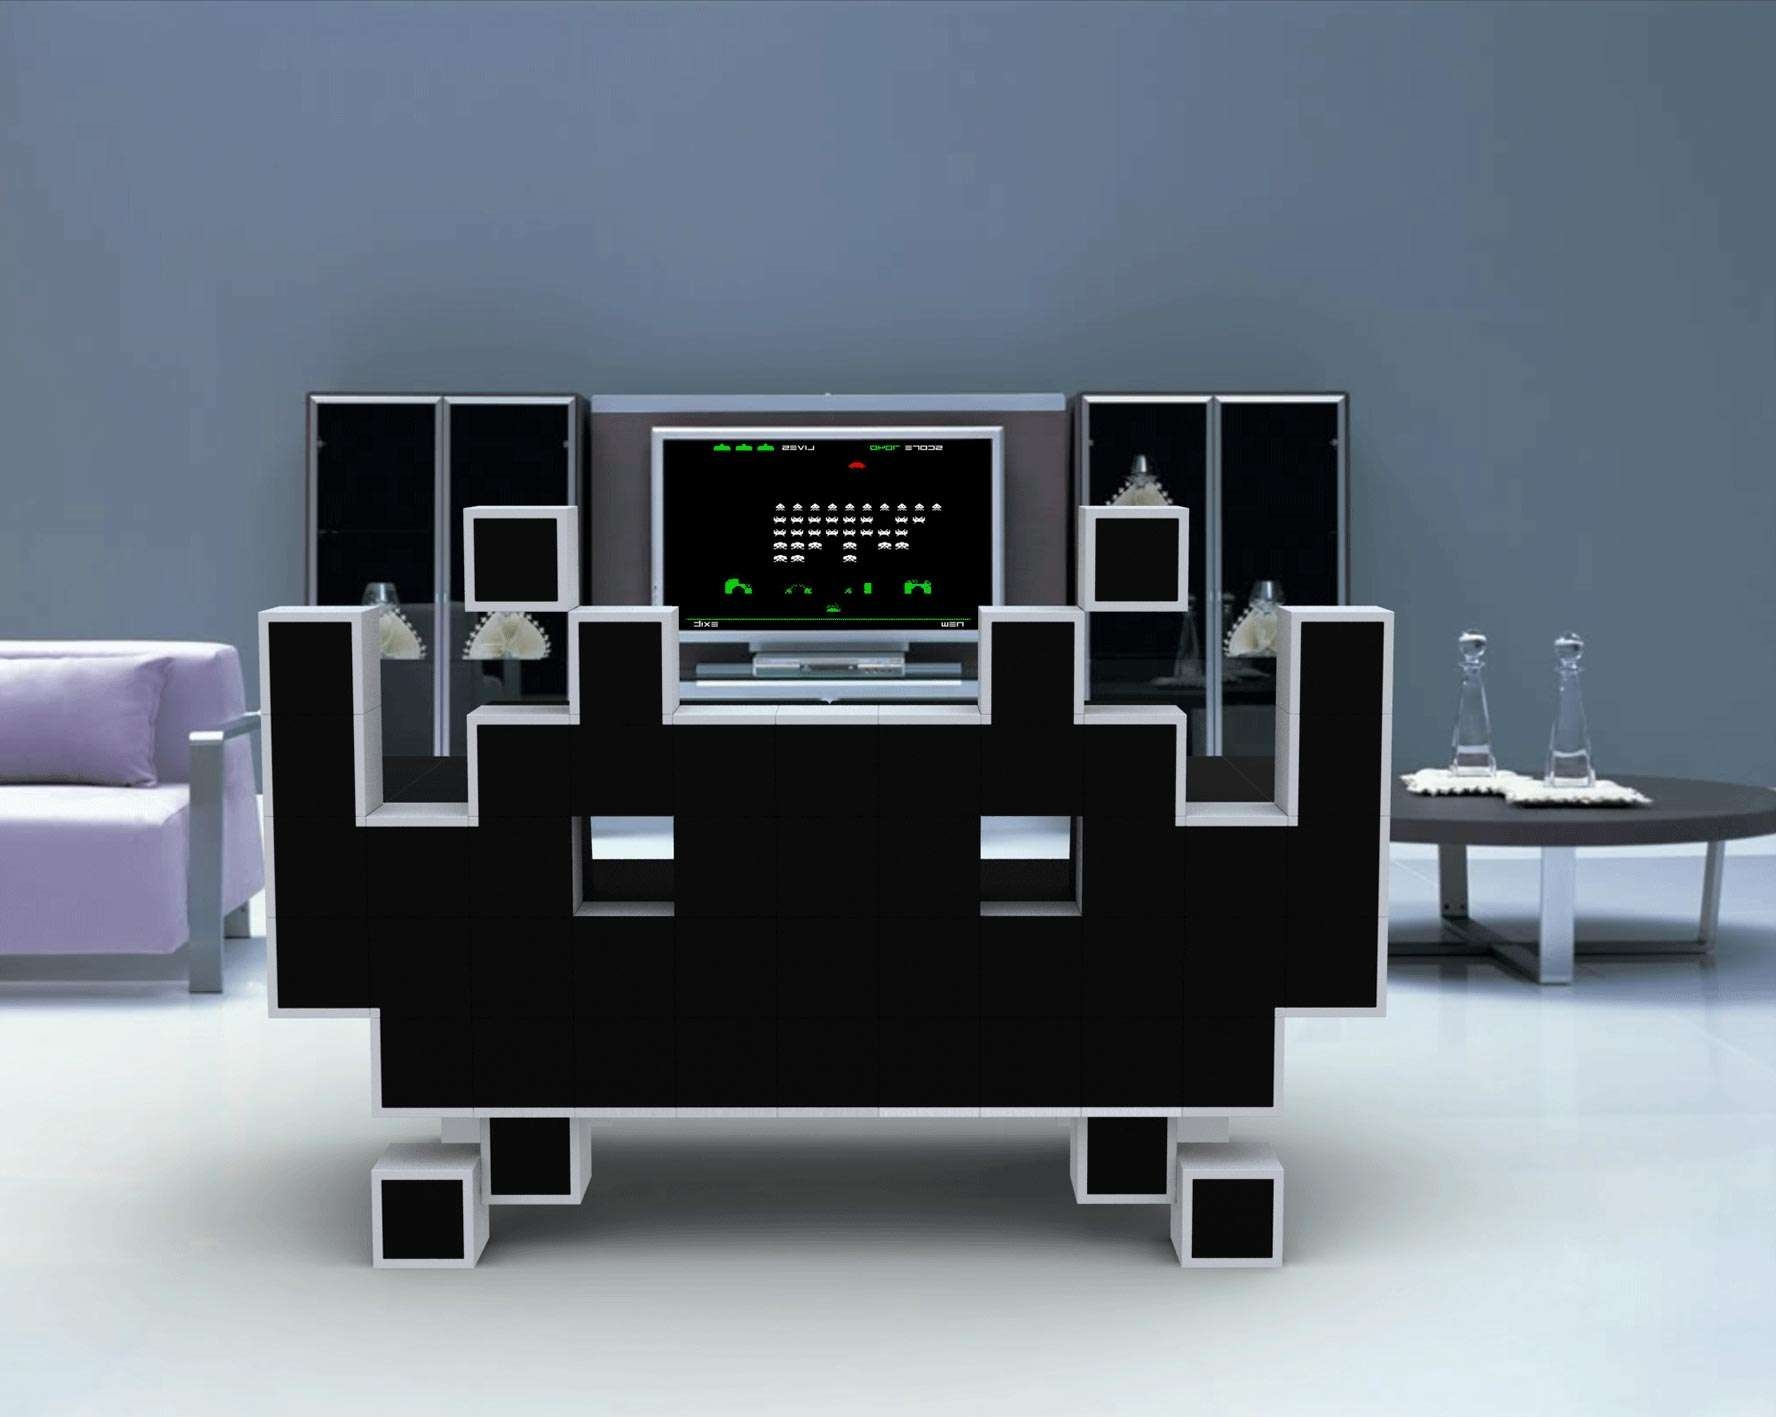 Unique Tv Stands. Unique Tv Stand Design (View 3 of 20)